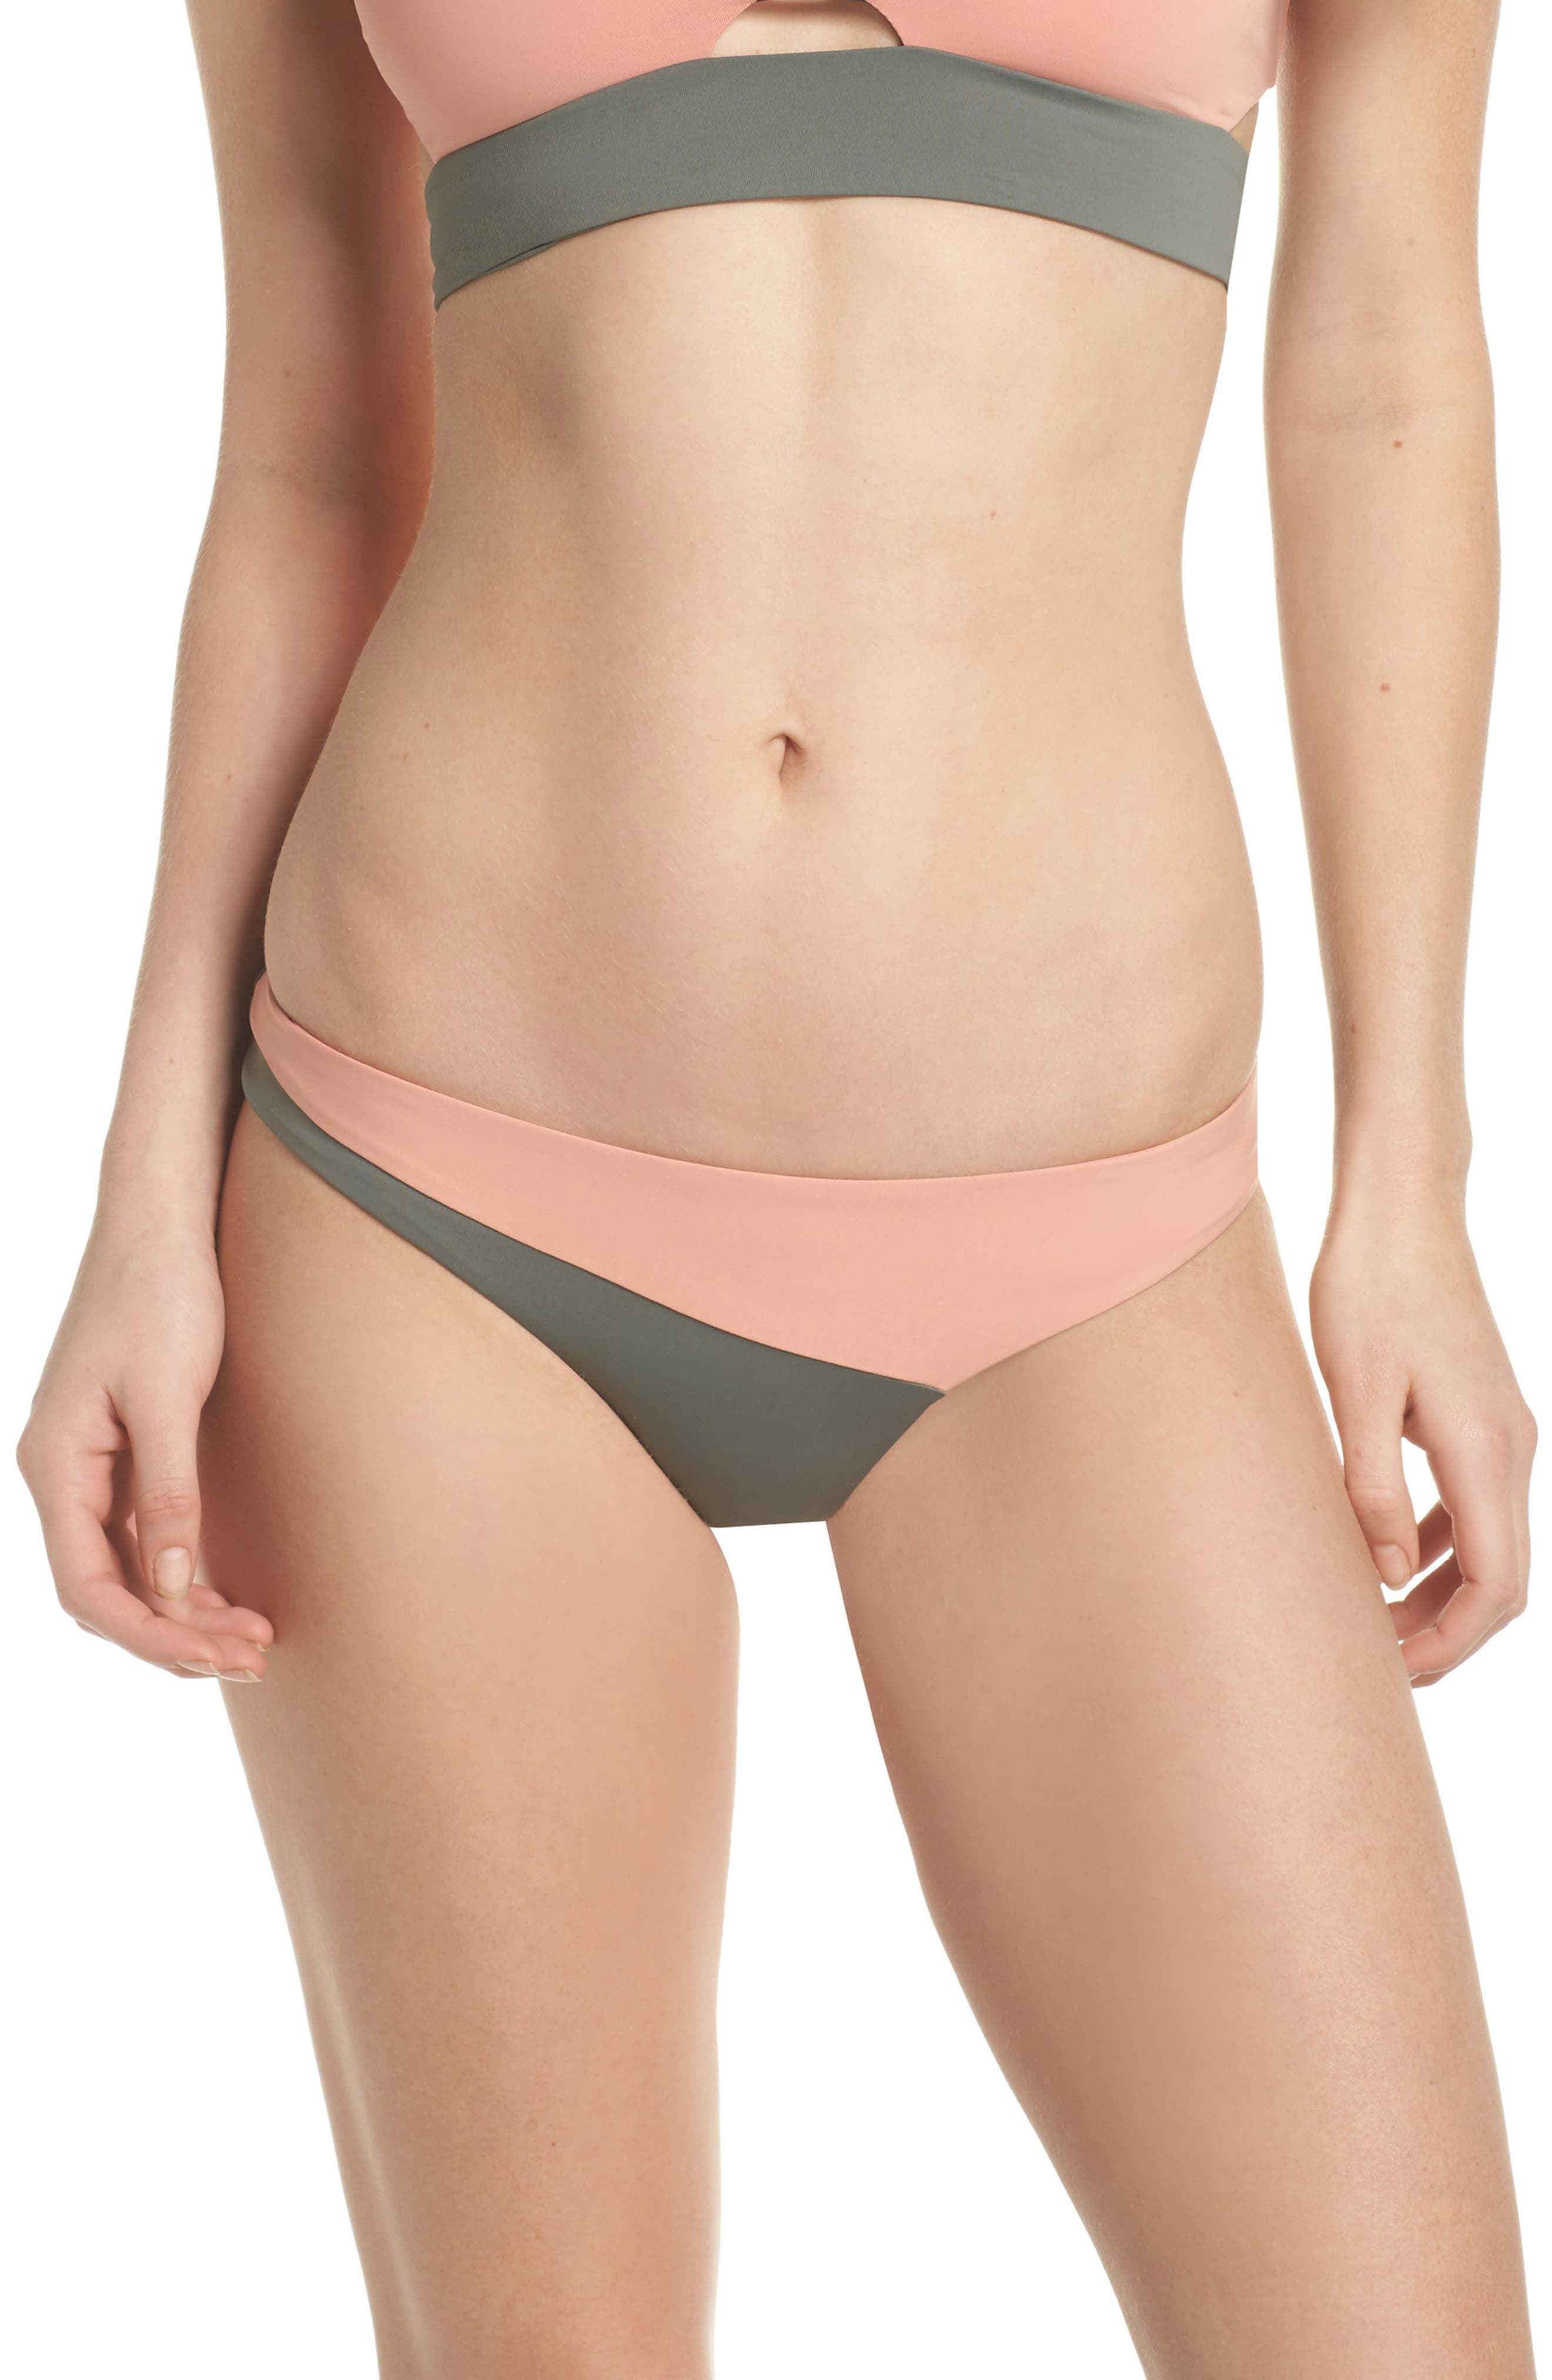 Jaclyn Hipster Bikini Bottoms,                             Main thumbnail 1, color,                             Desert Clay/ Cove Grey